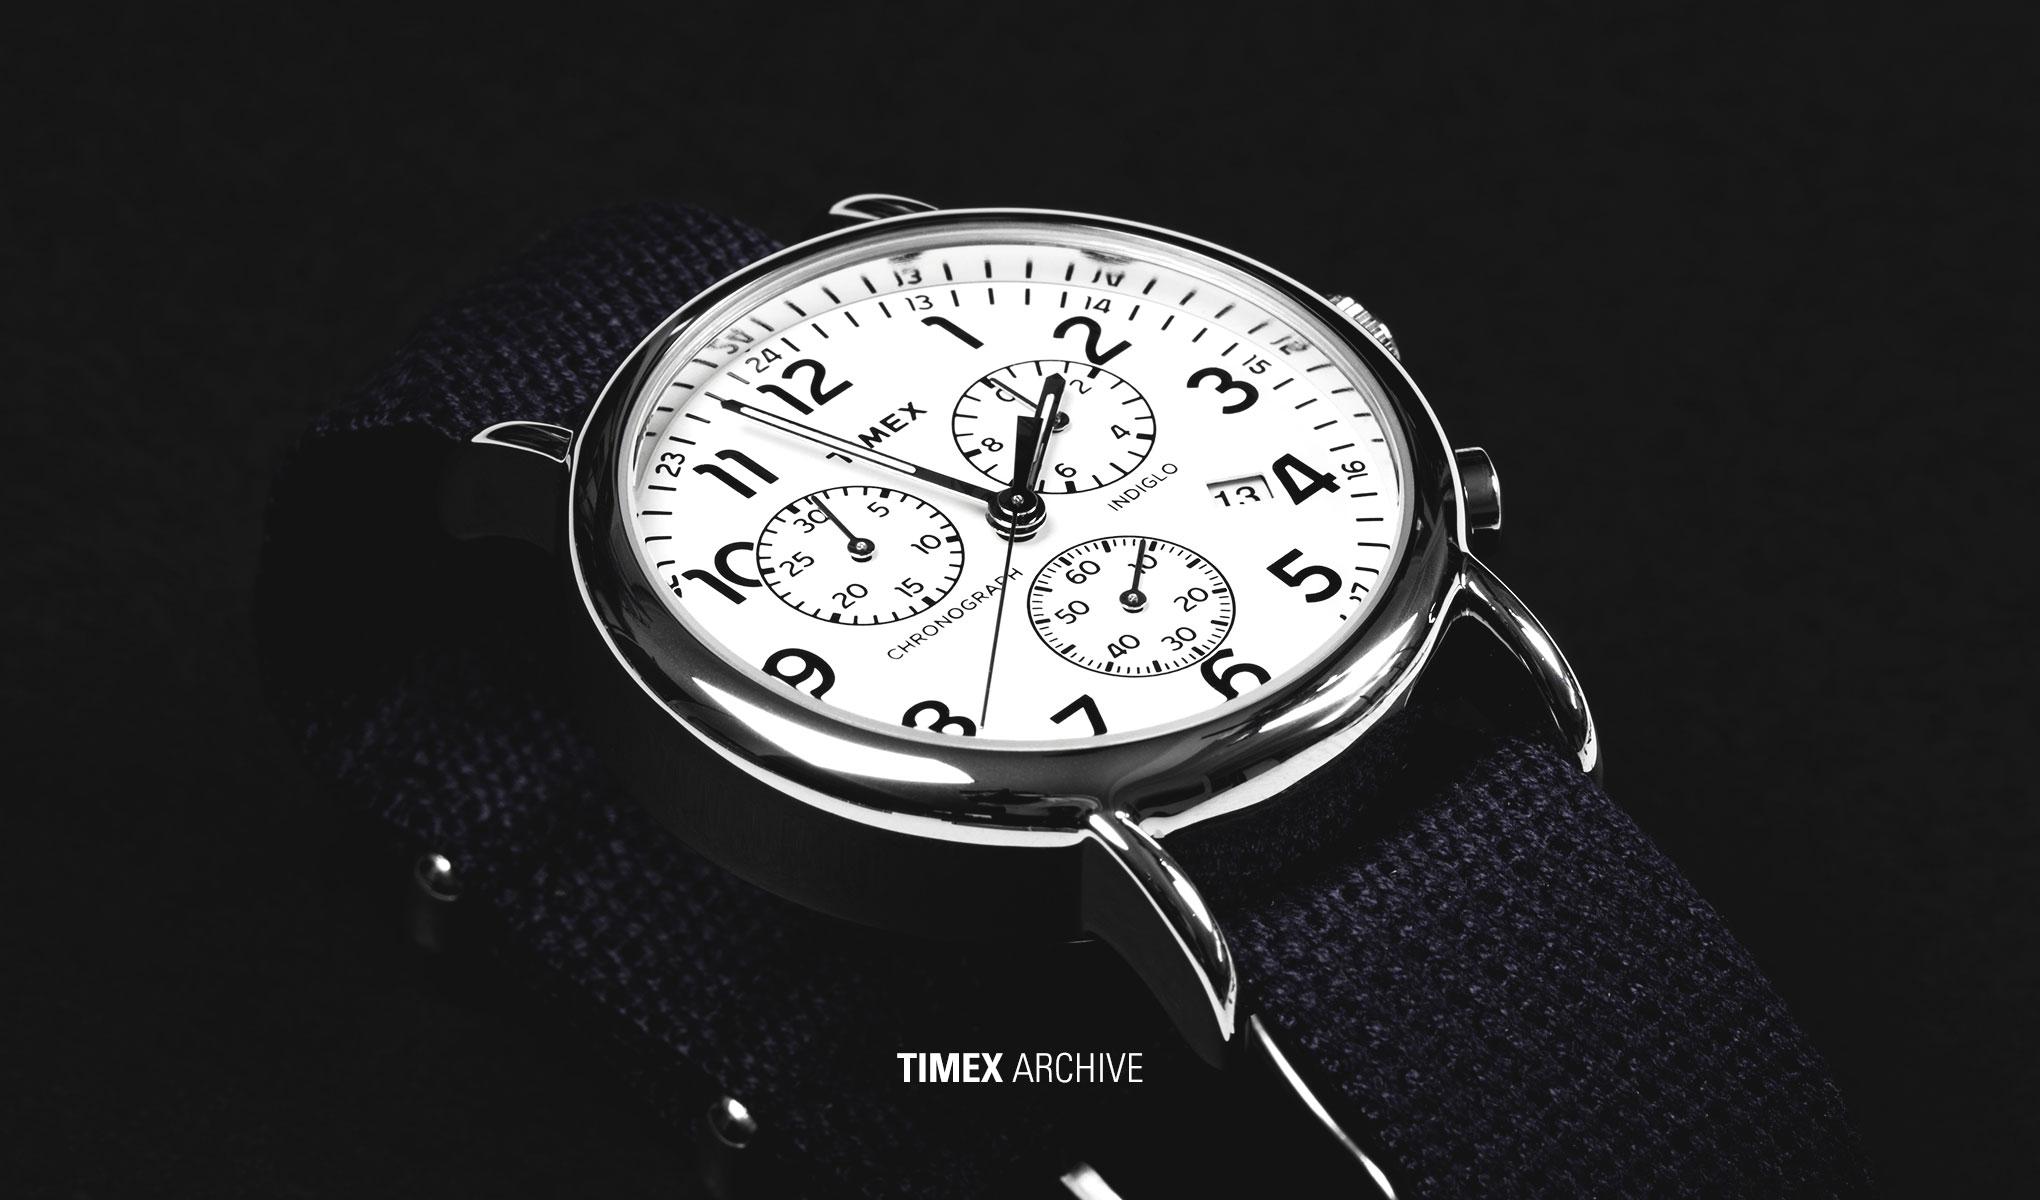 Timex Archive (Premium Italian Wrist Watches) - Shop now at Streetmachine Copenhagen.